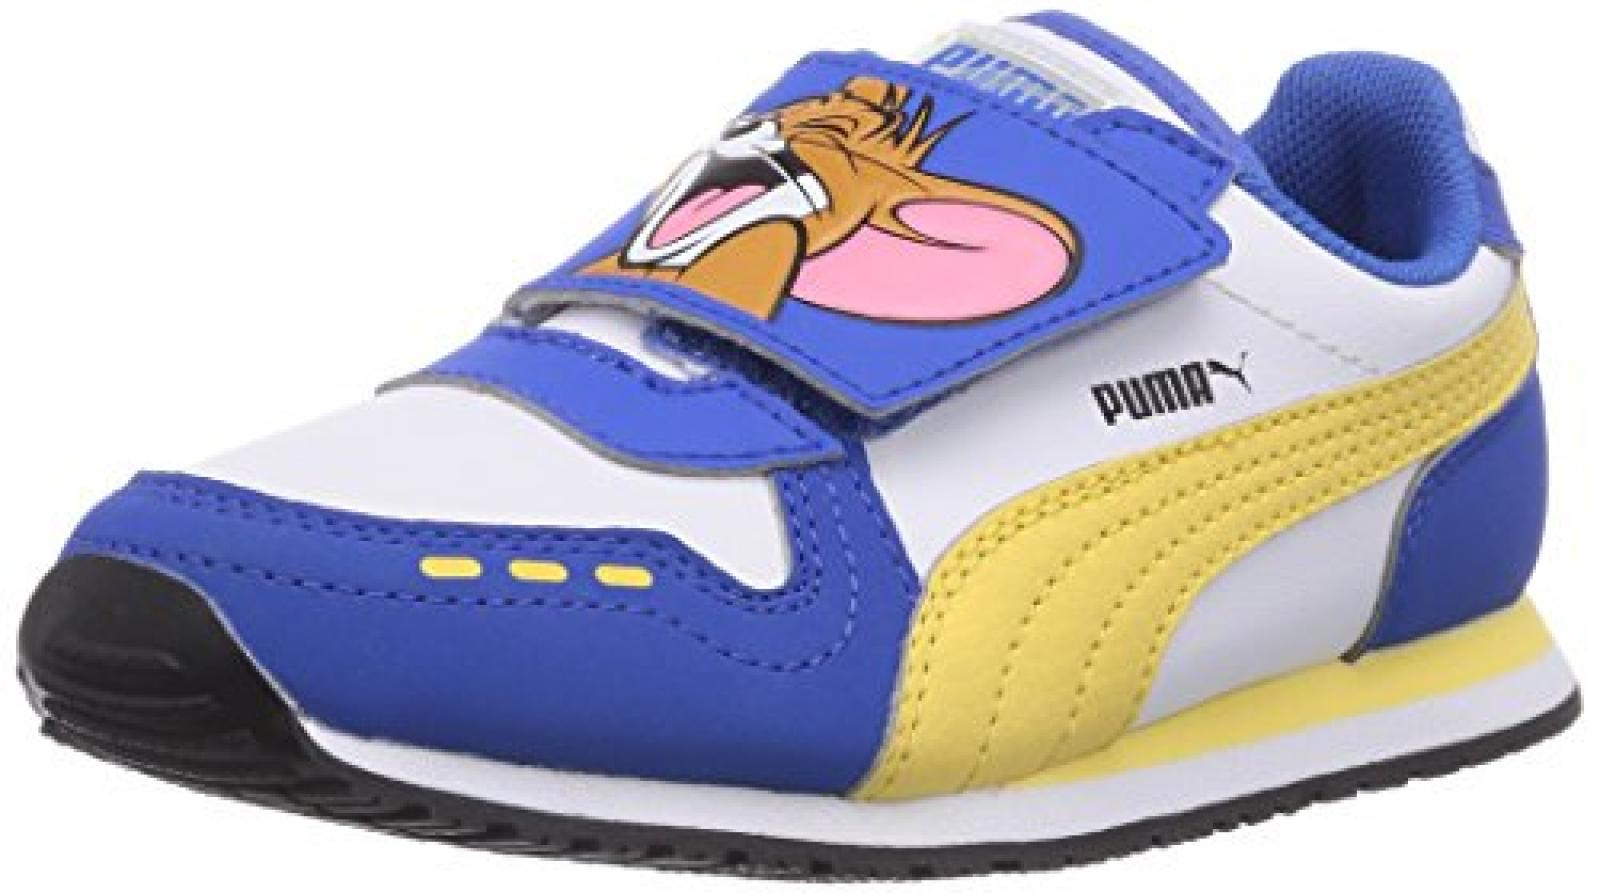 Puma Cabana Racer Tom & Jerry Unisex-Kinder Sneakers